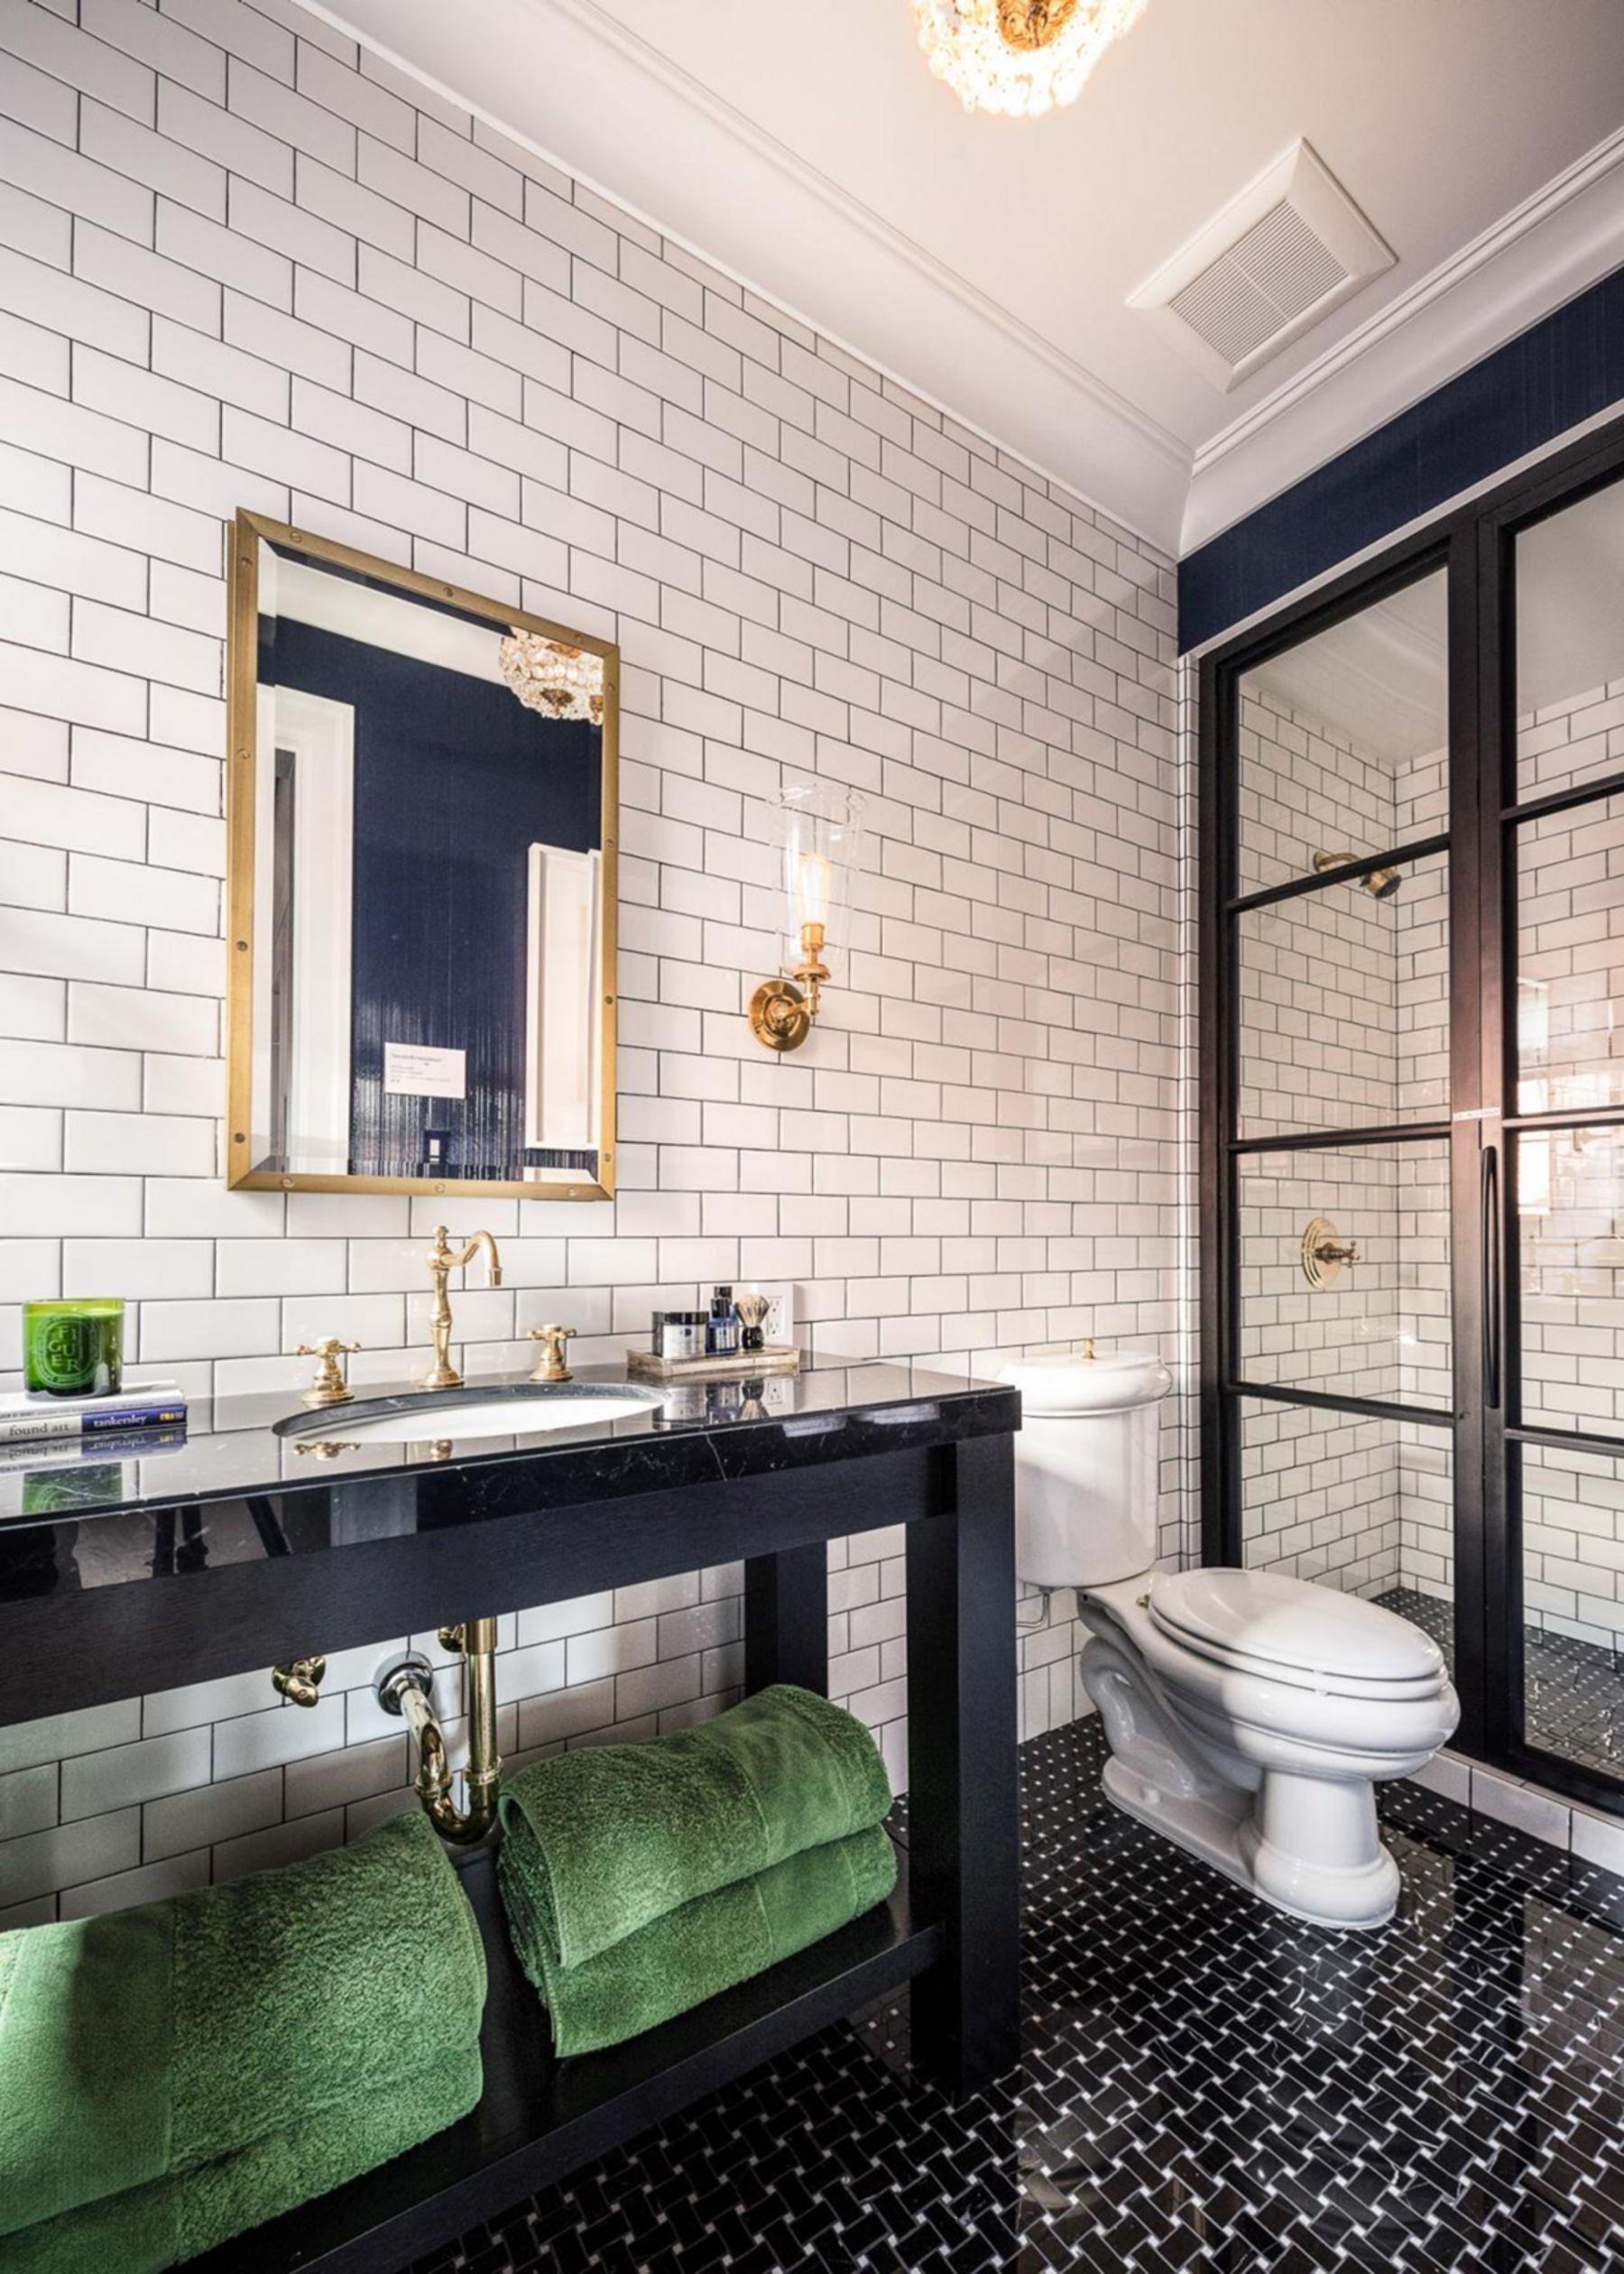 10 Awesome Industrial Bathroom Design Ideas To Make Your Bathroom Modern Industrial Style Bathroom Bathroom Styling 2015 Interior Design